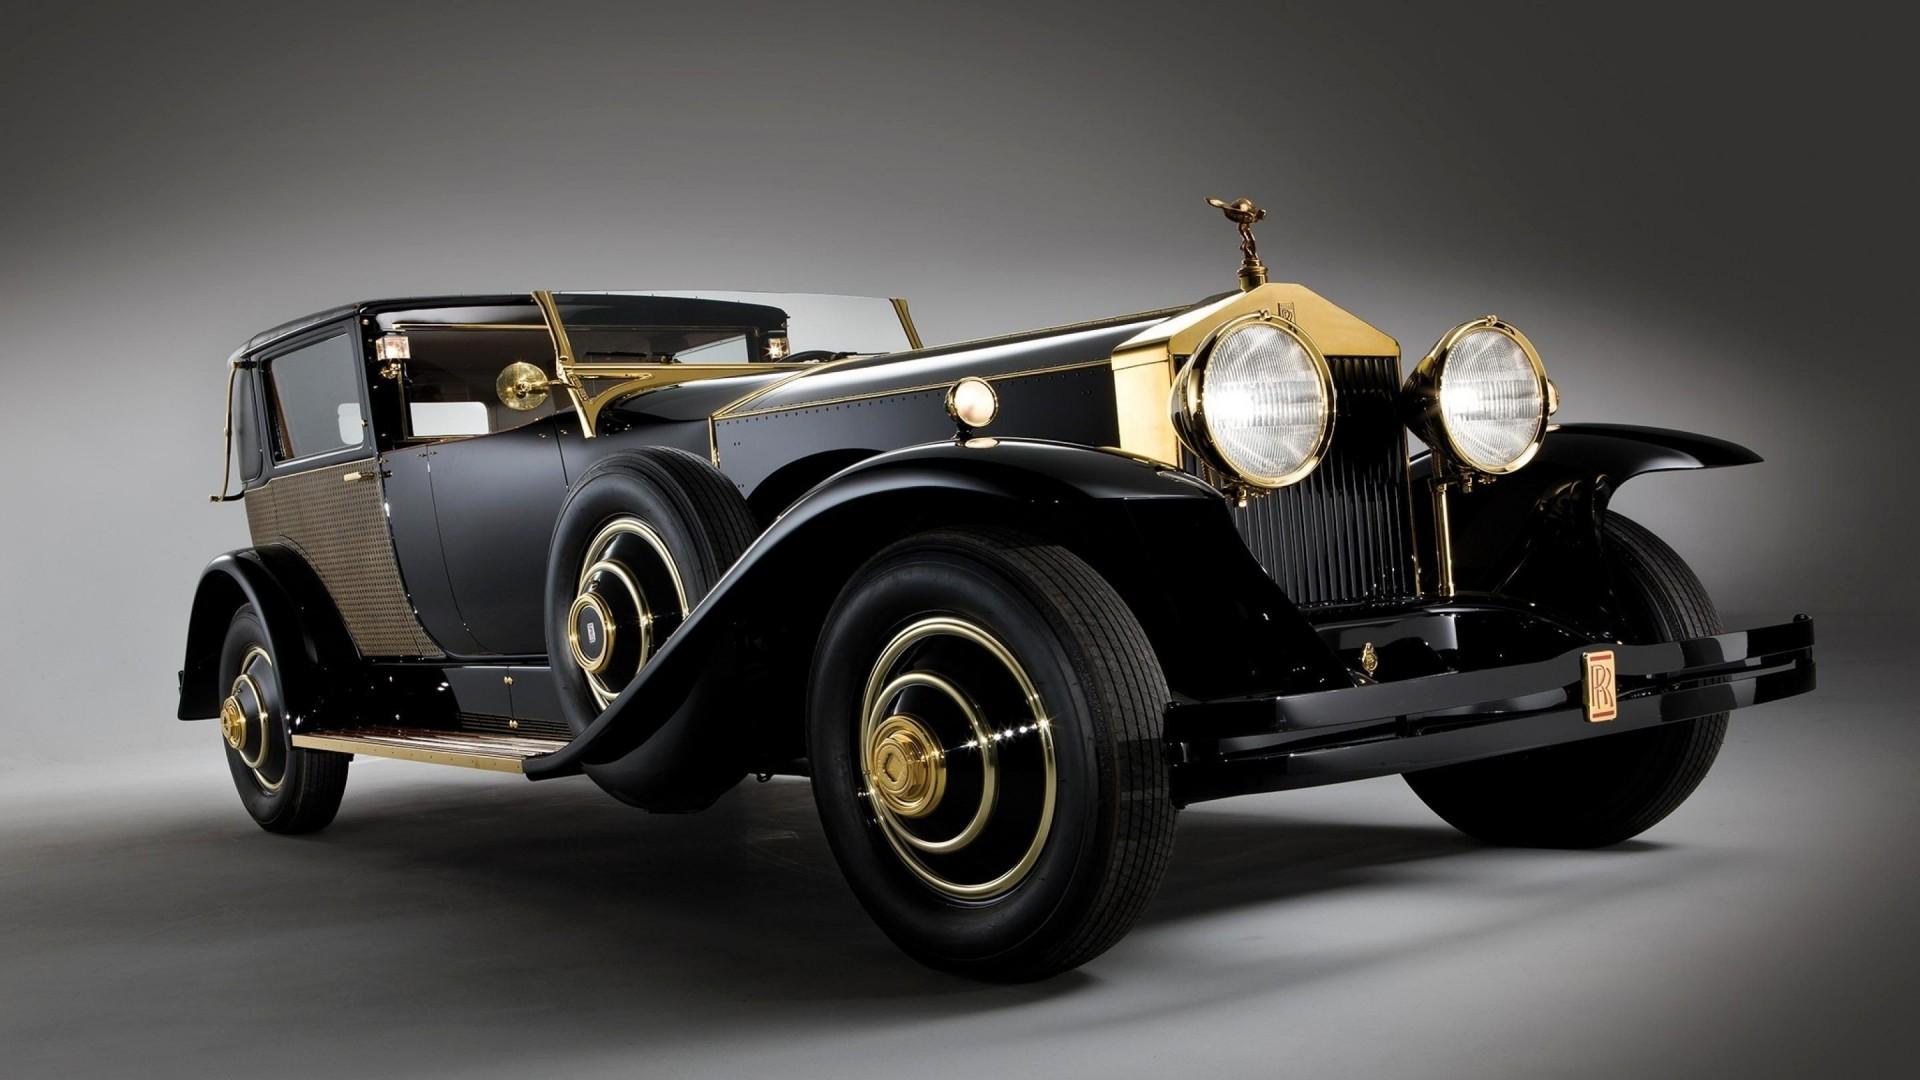 Classic Car - Die Carfactory